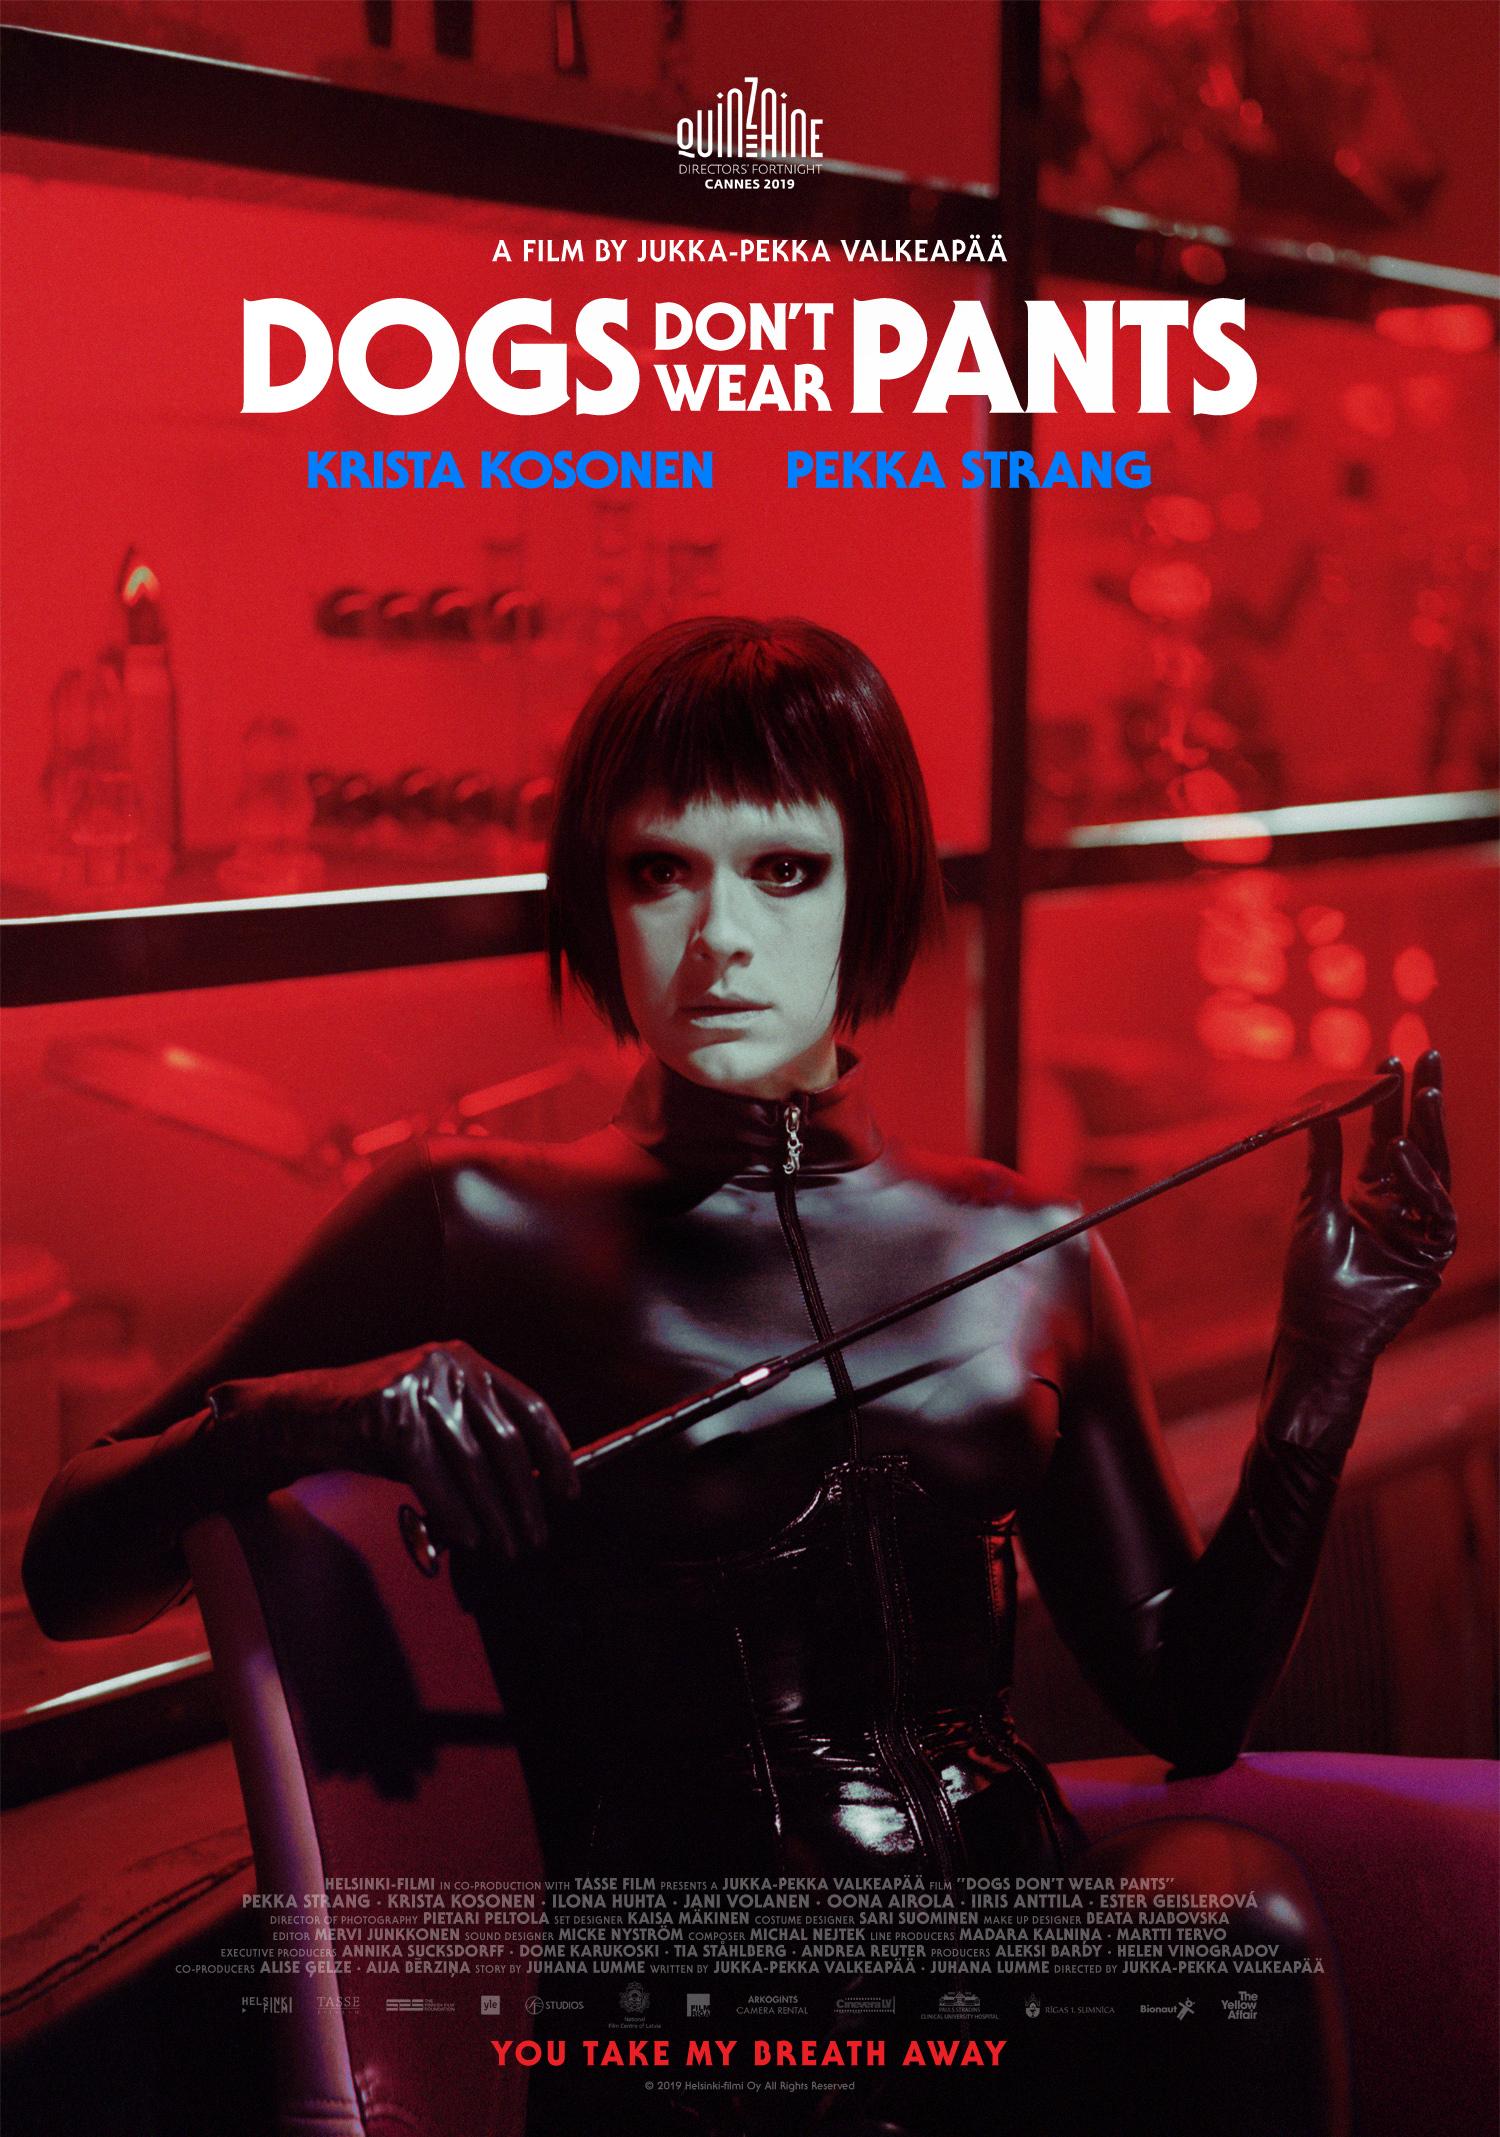 собаки не носят штанов 2019 постер